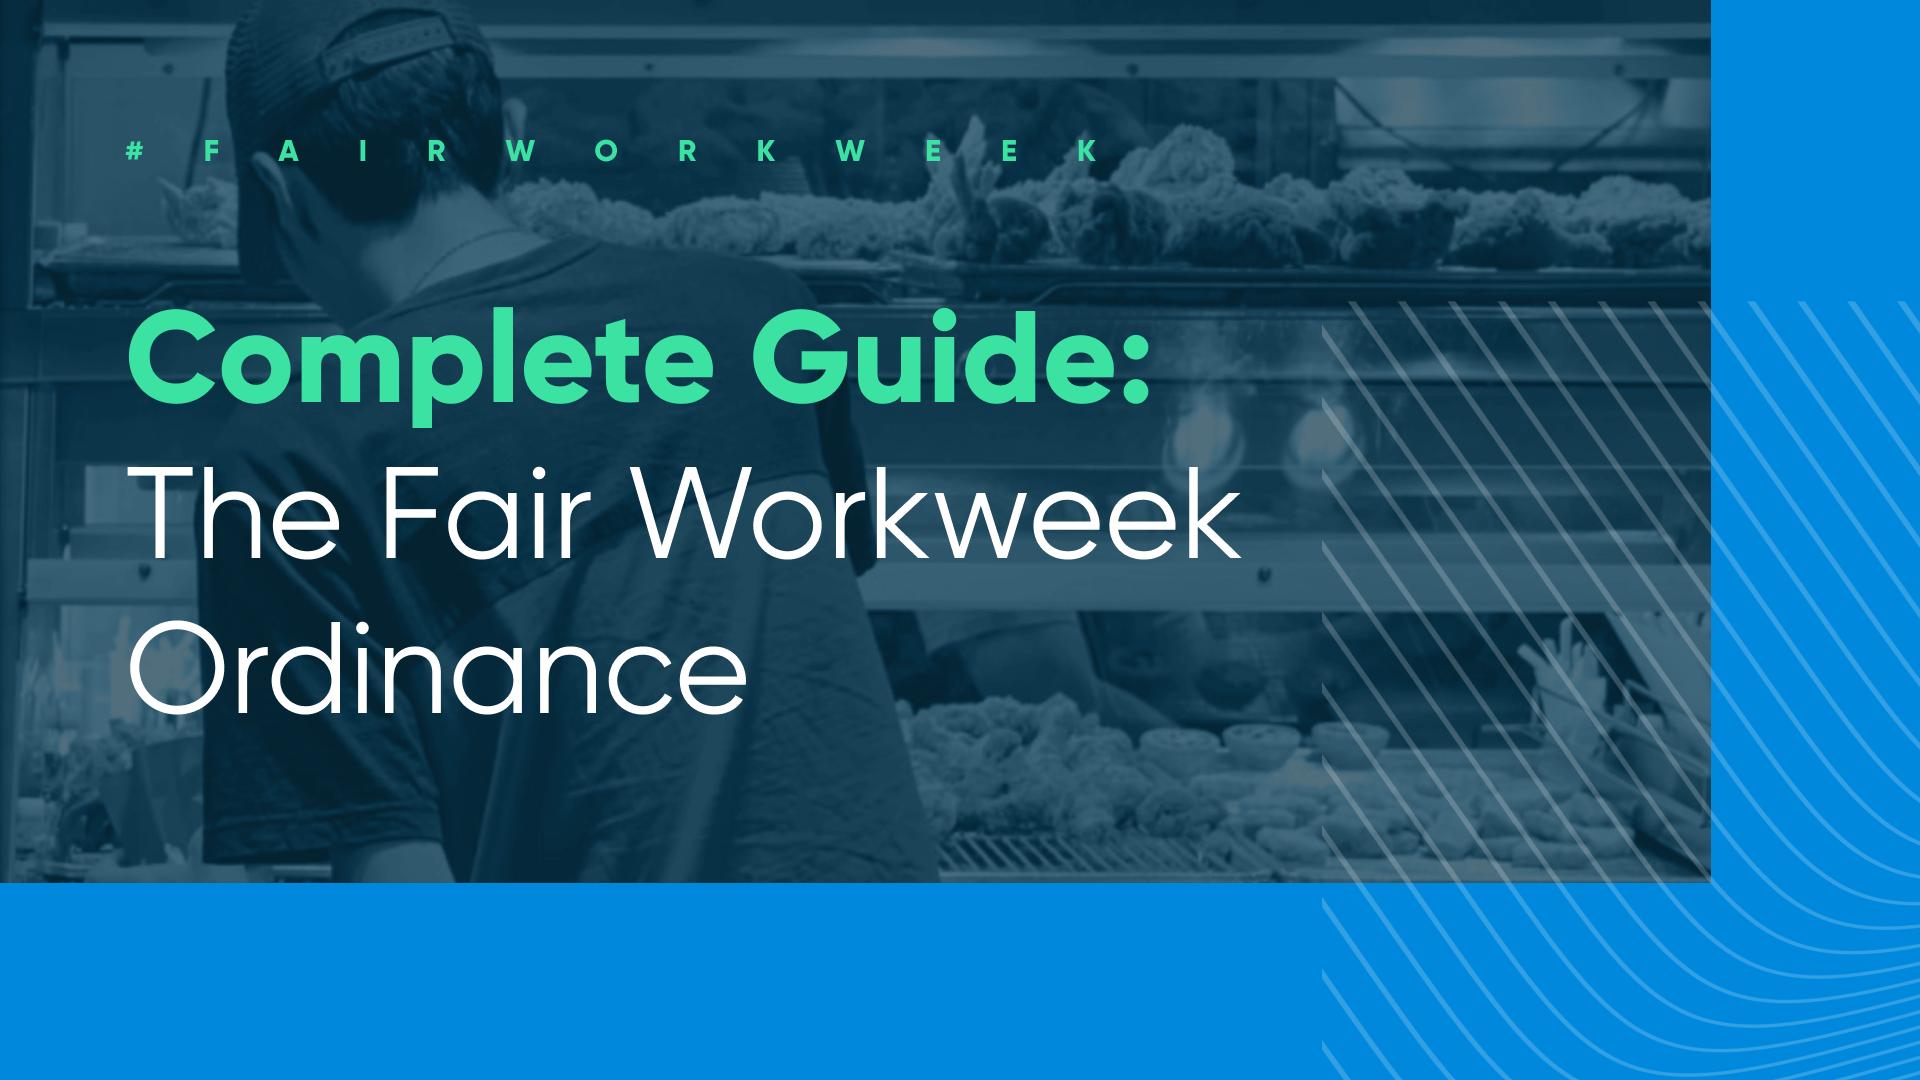 Harri Complete Fair Workweek Ordinance guide